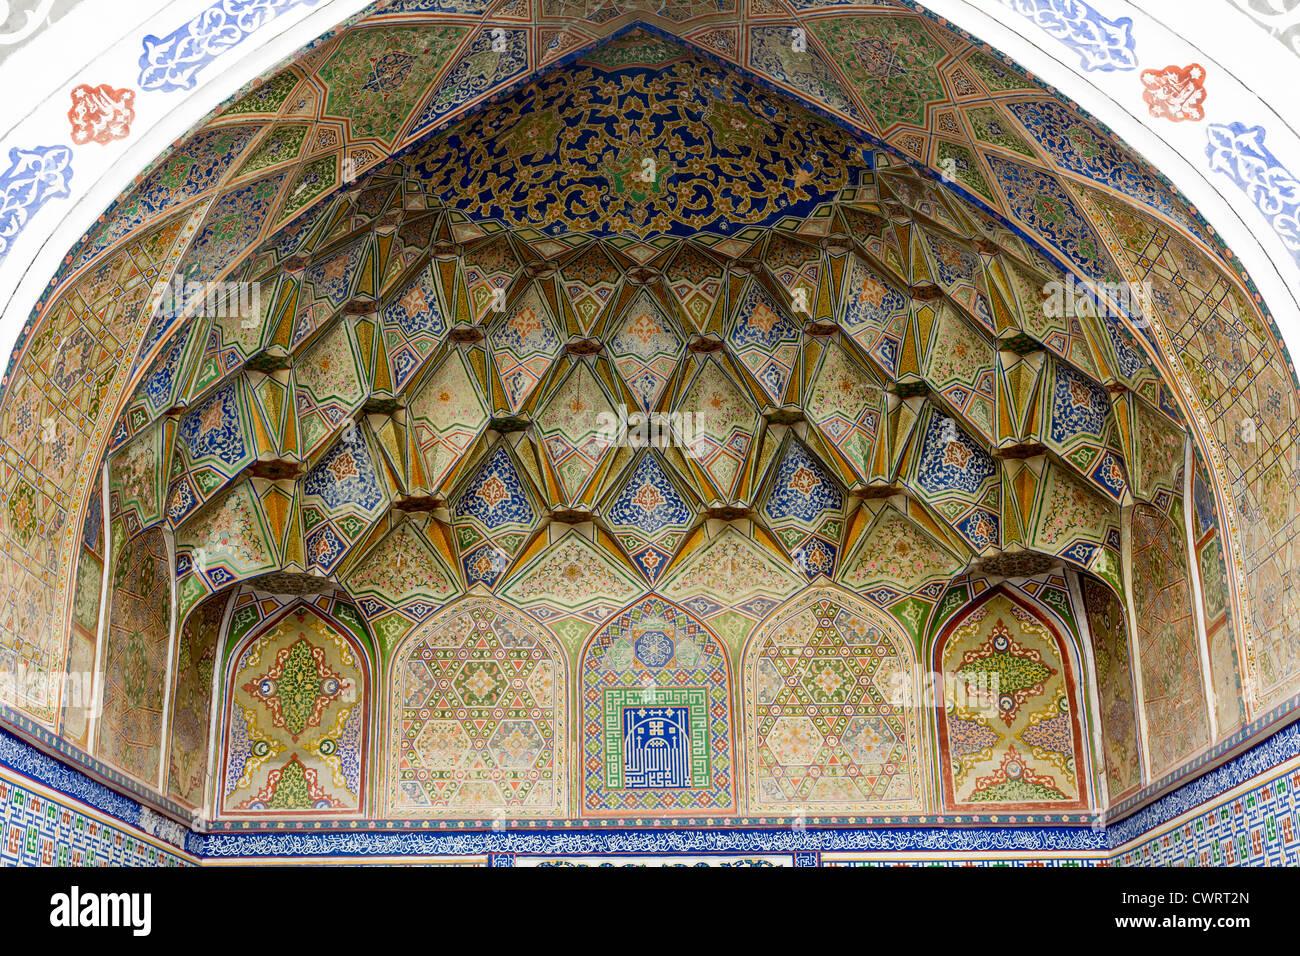 Detail Of Painting, Bala Hauz Mosque, Bukhara, Uzbekistan